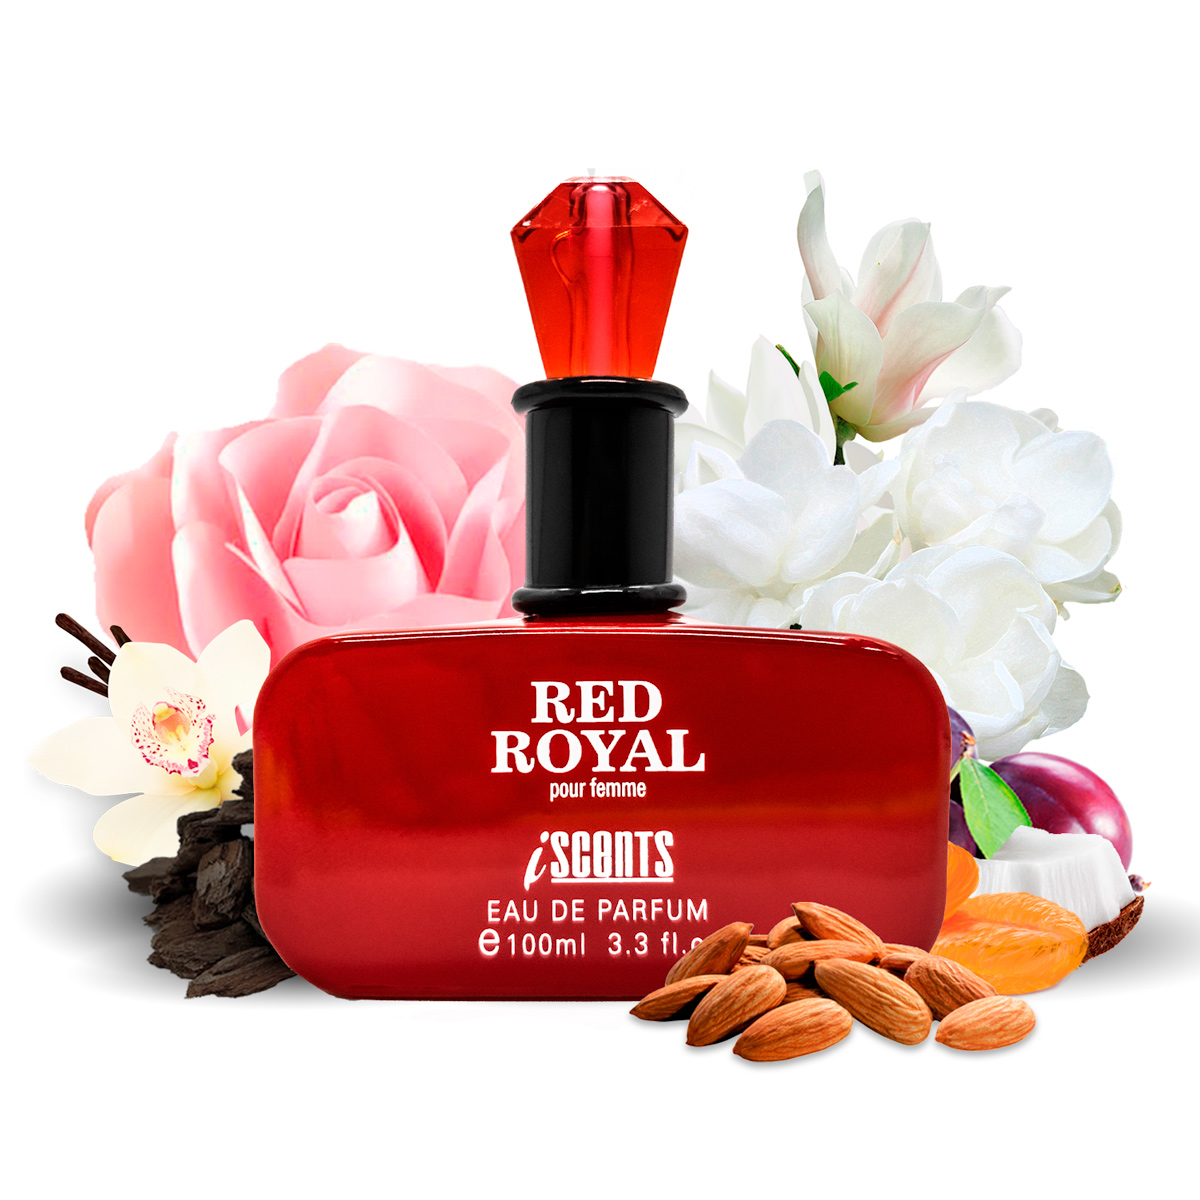 Kit 2 Perfumes Importados Red Royal e Noir Gem I Scents